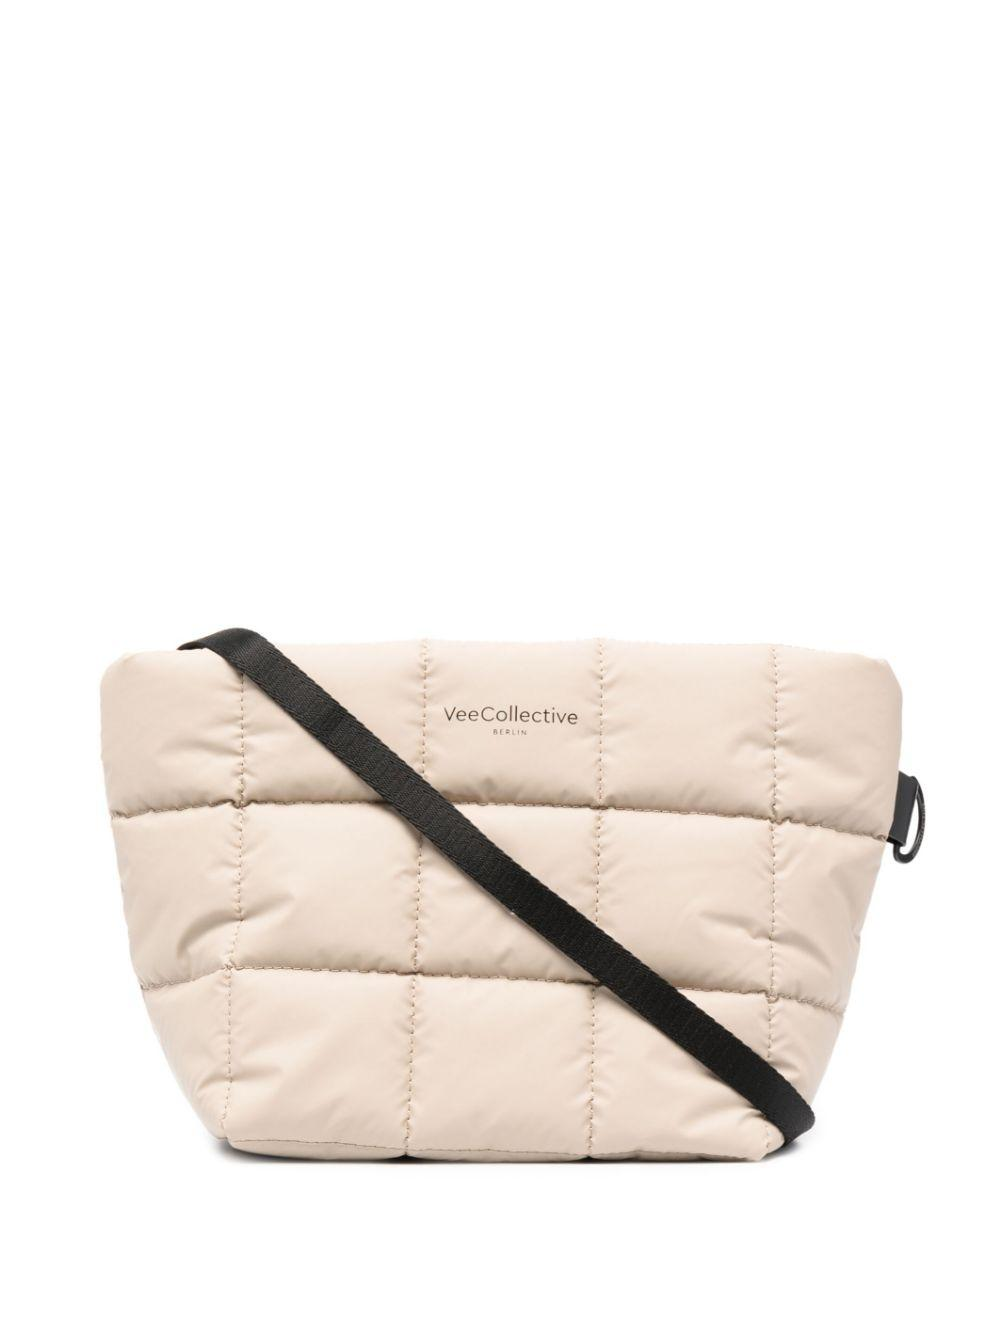 Porter Bag Item # 117-200-349